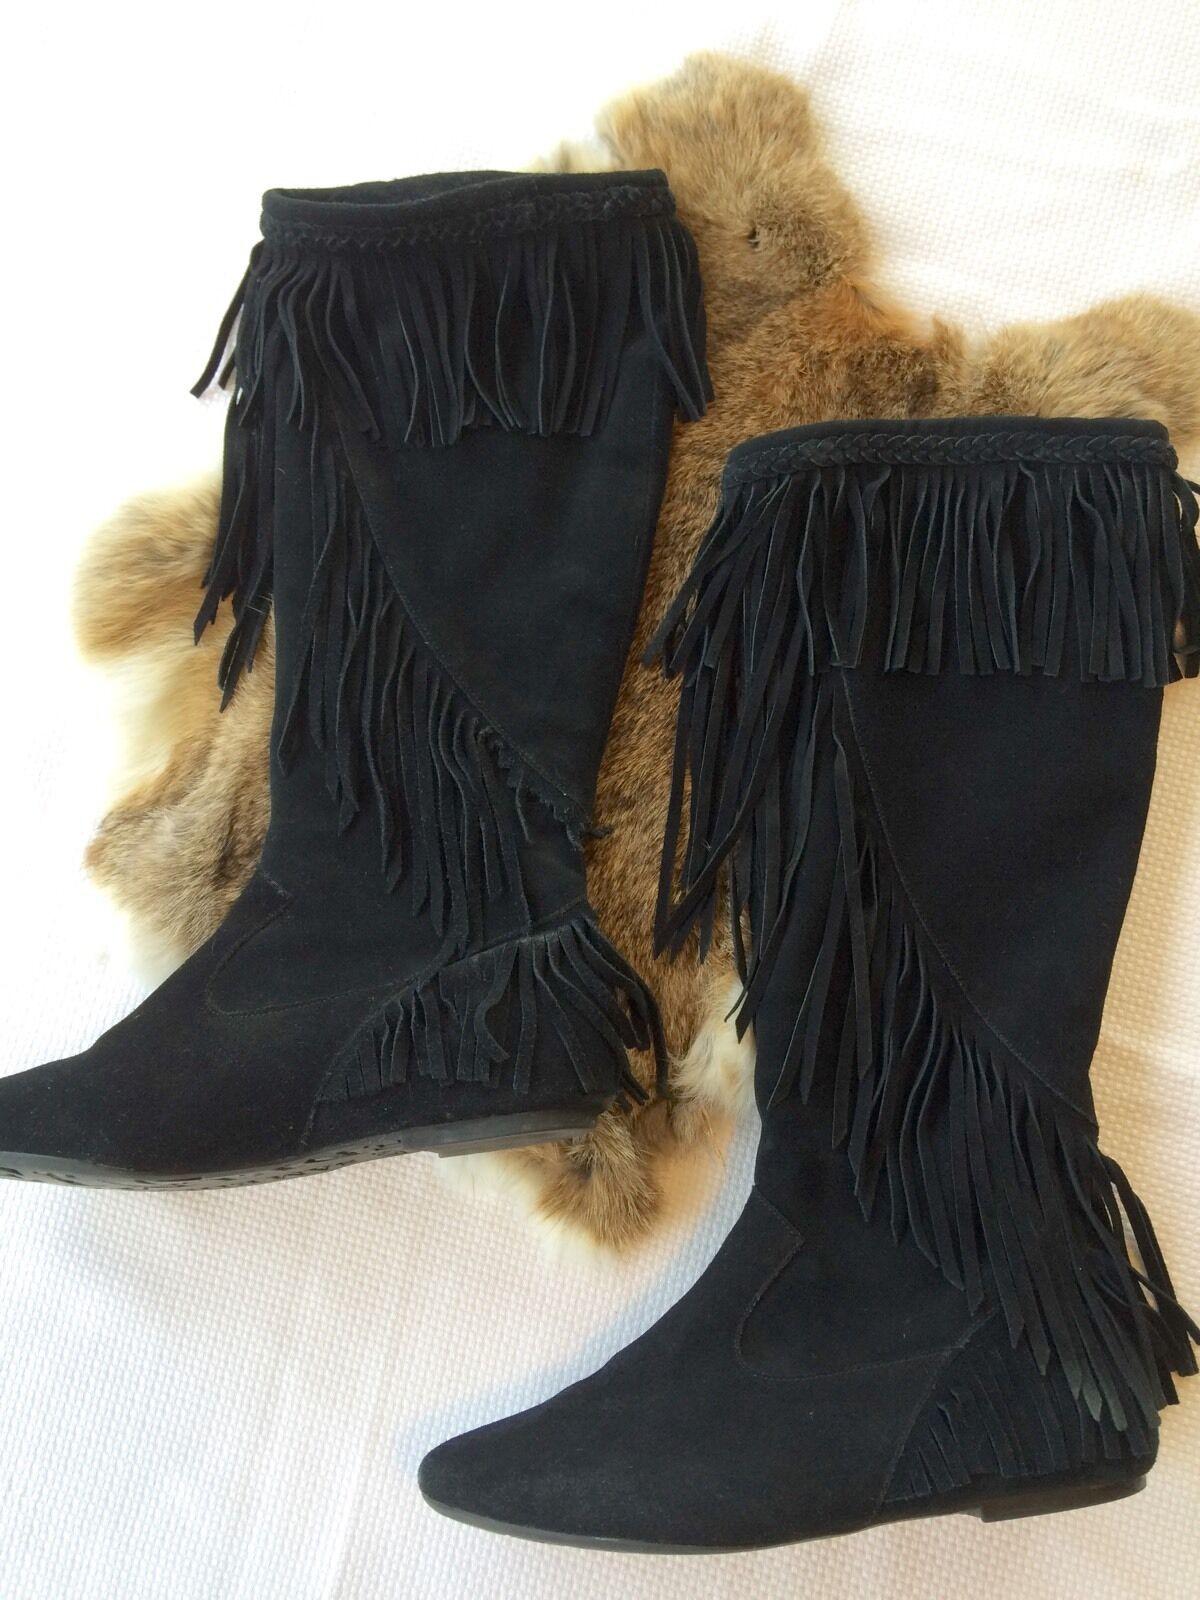 Women's Sam Edelman Black Suede Fringe Knee High Boot Size 7.5